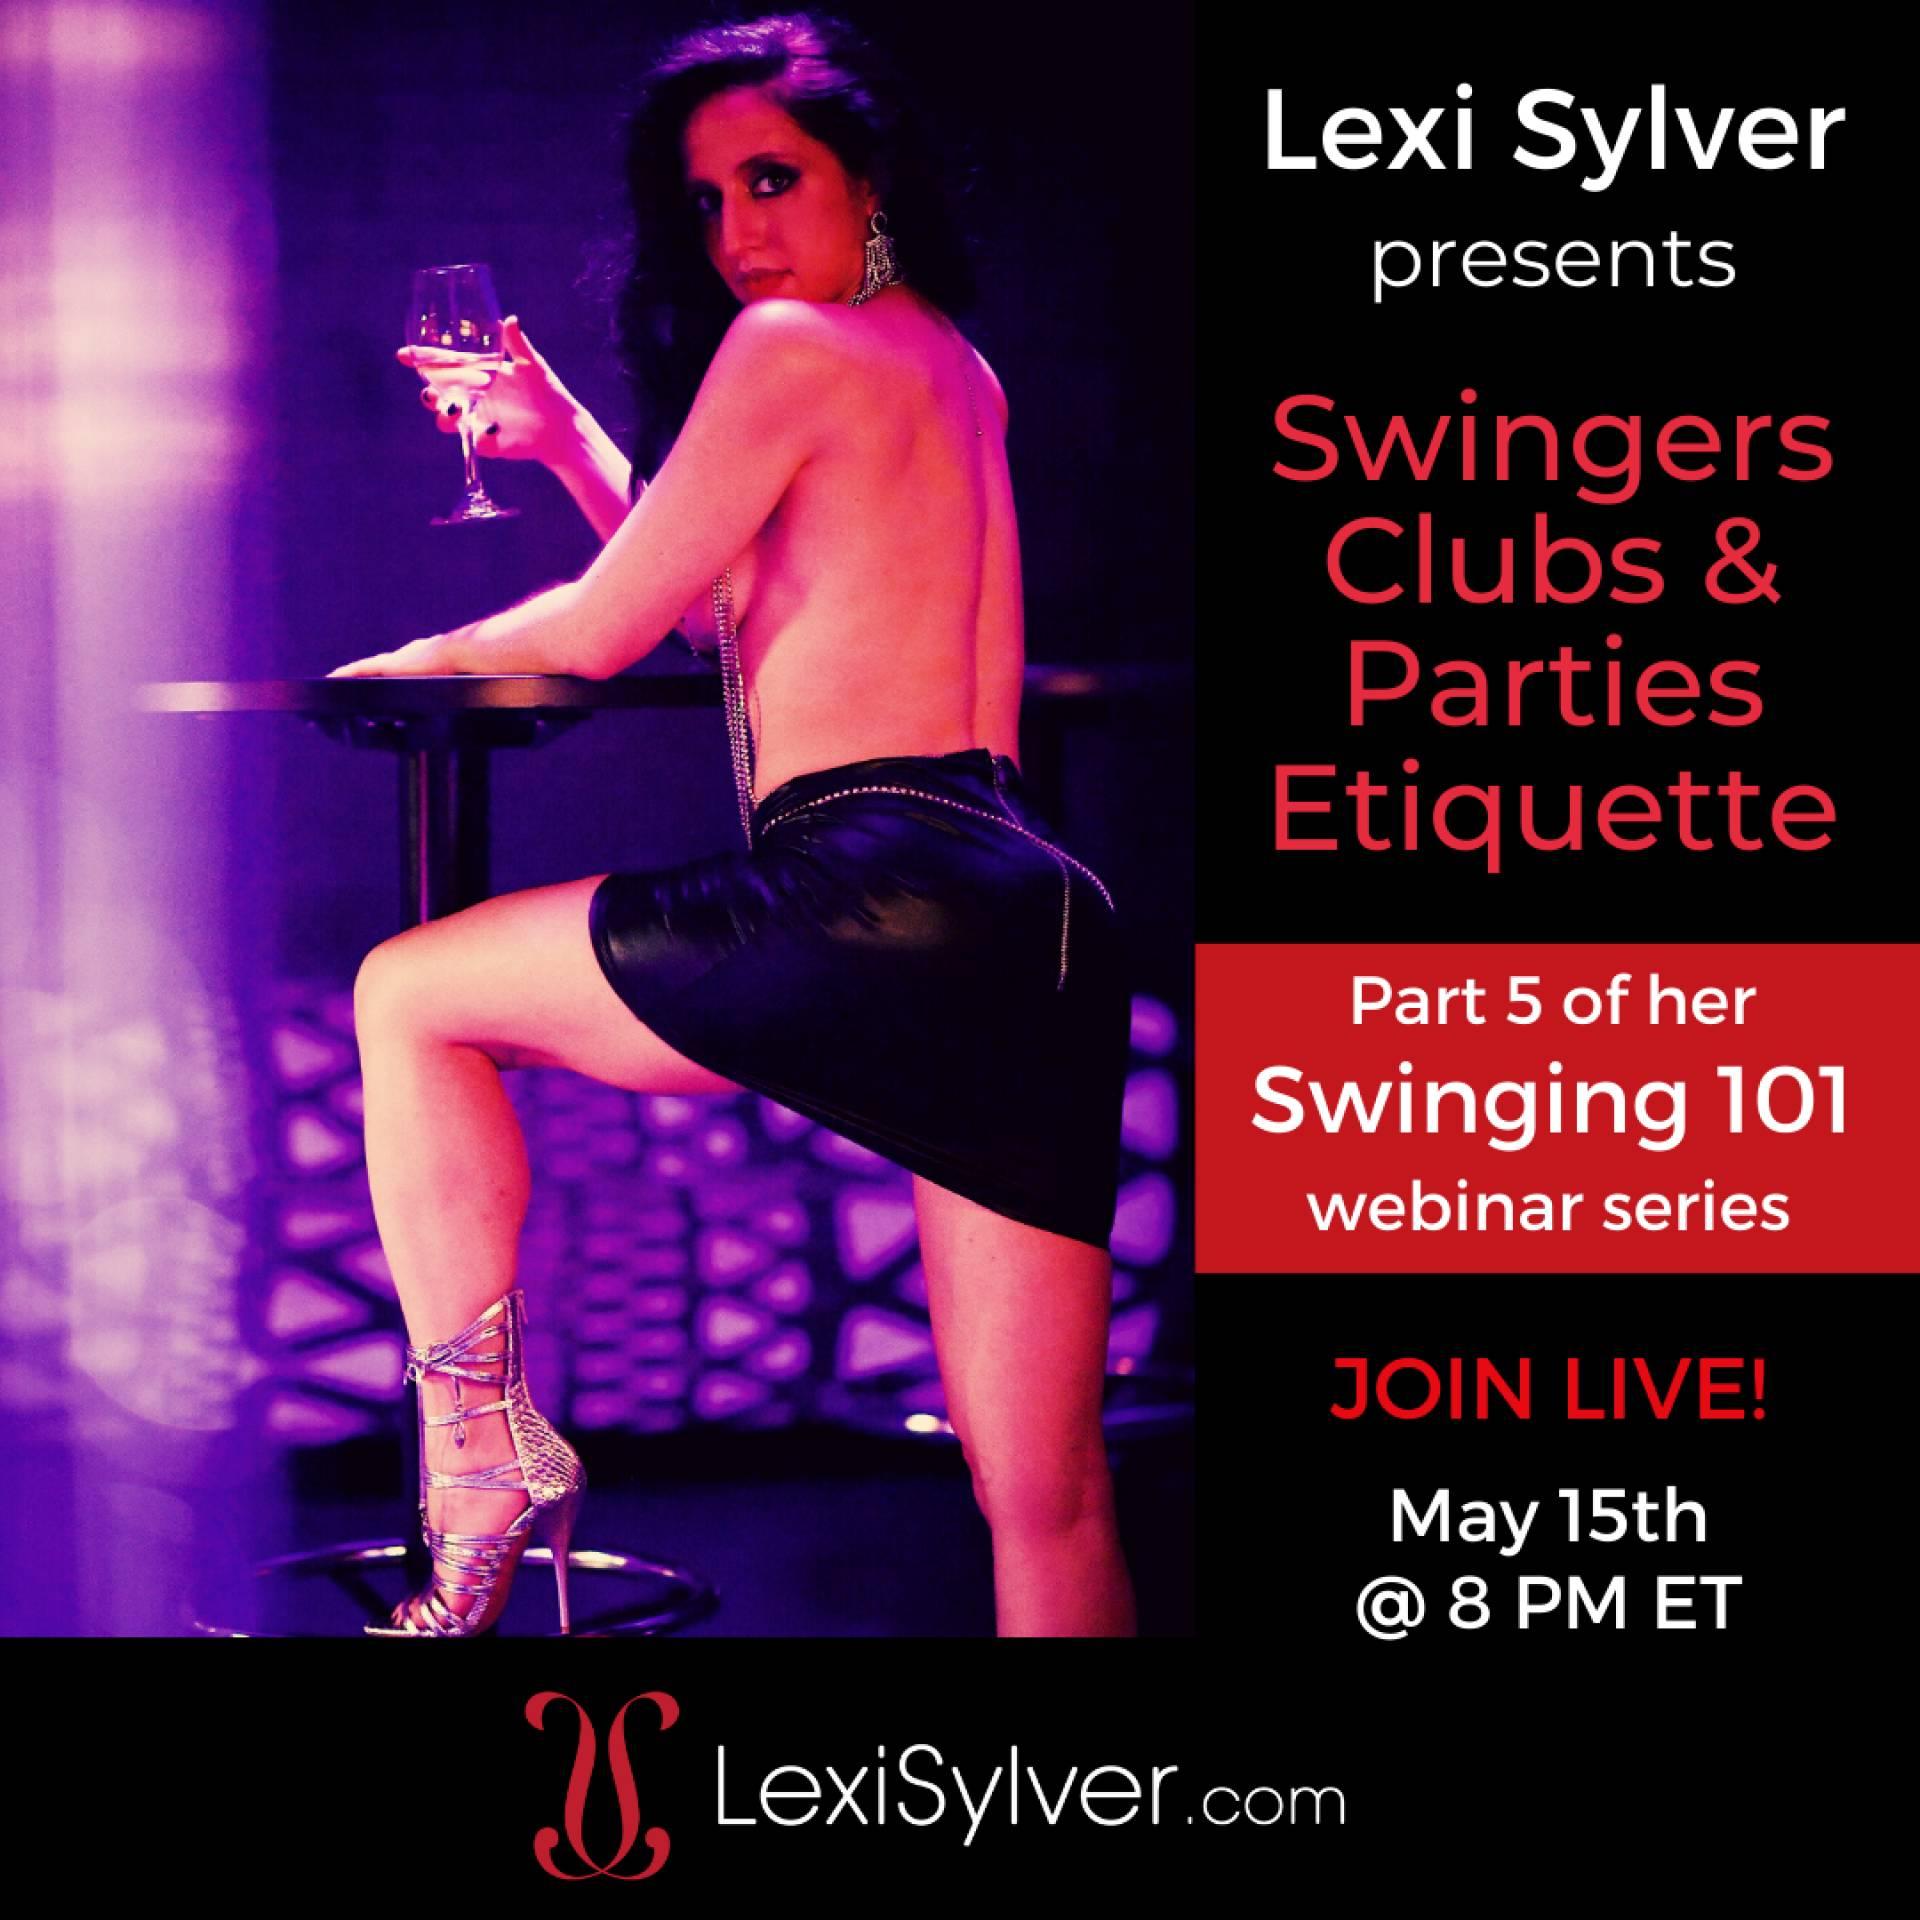 Lexi Sylver's Swinging 101 Part 5: Swingers Clubs and Parties Etiquette